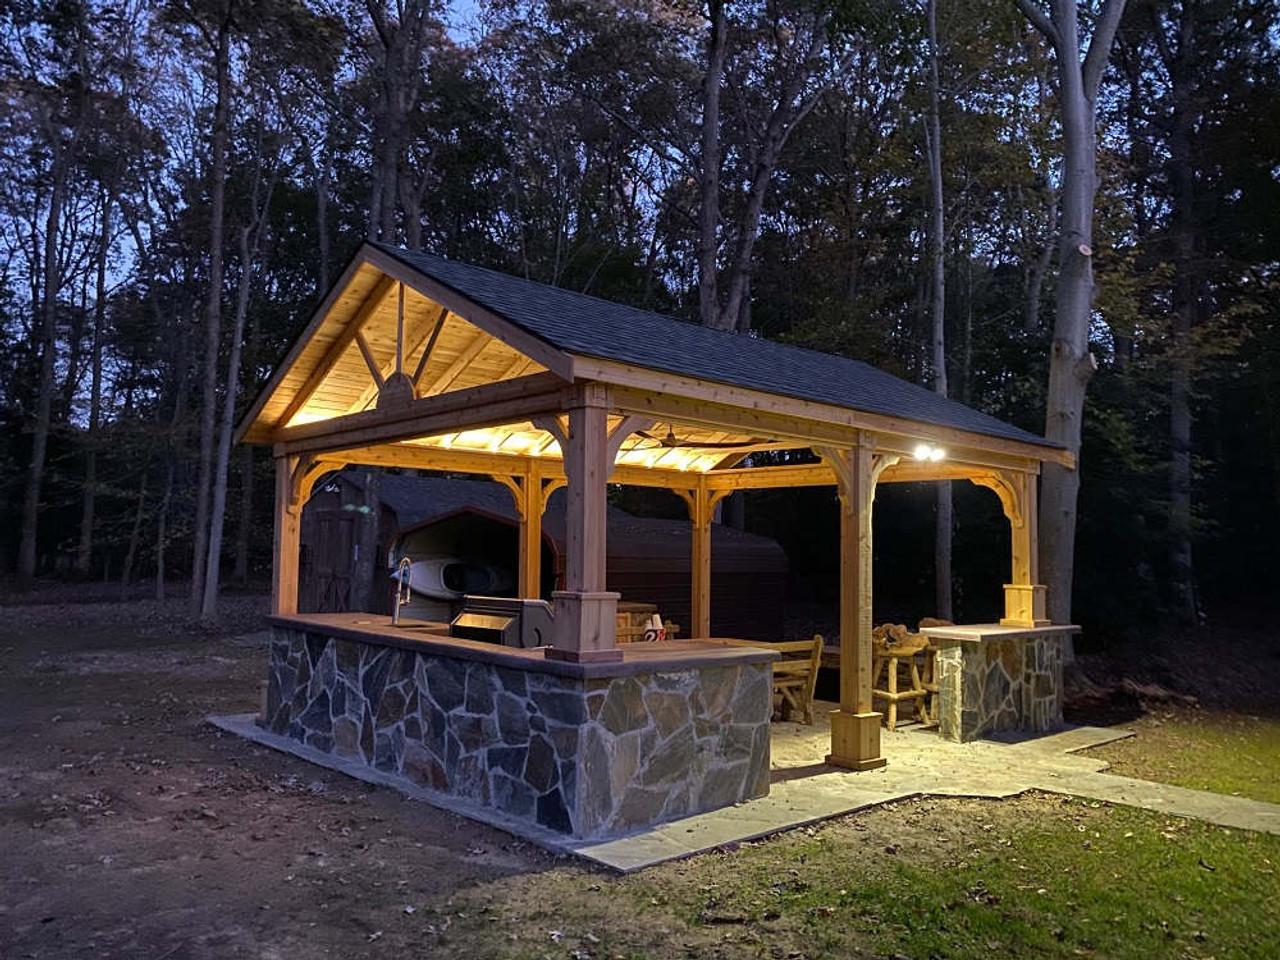 16x20 Red Cedar Gable Roof Pavilion Kit, White Plains, MD